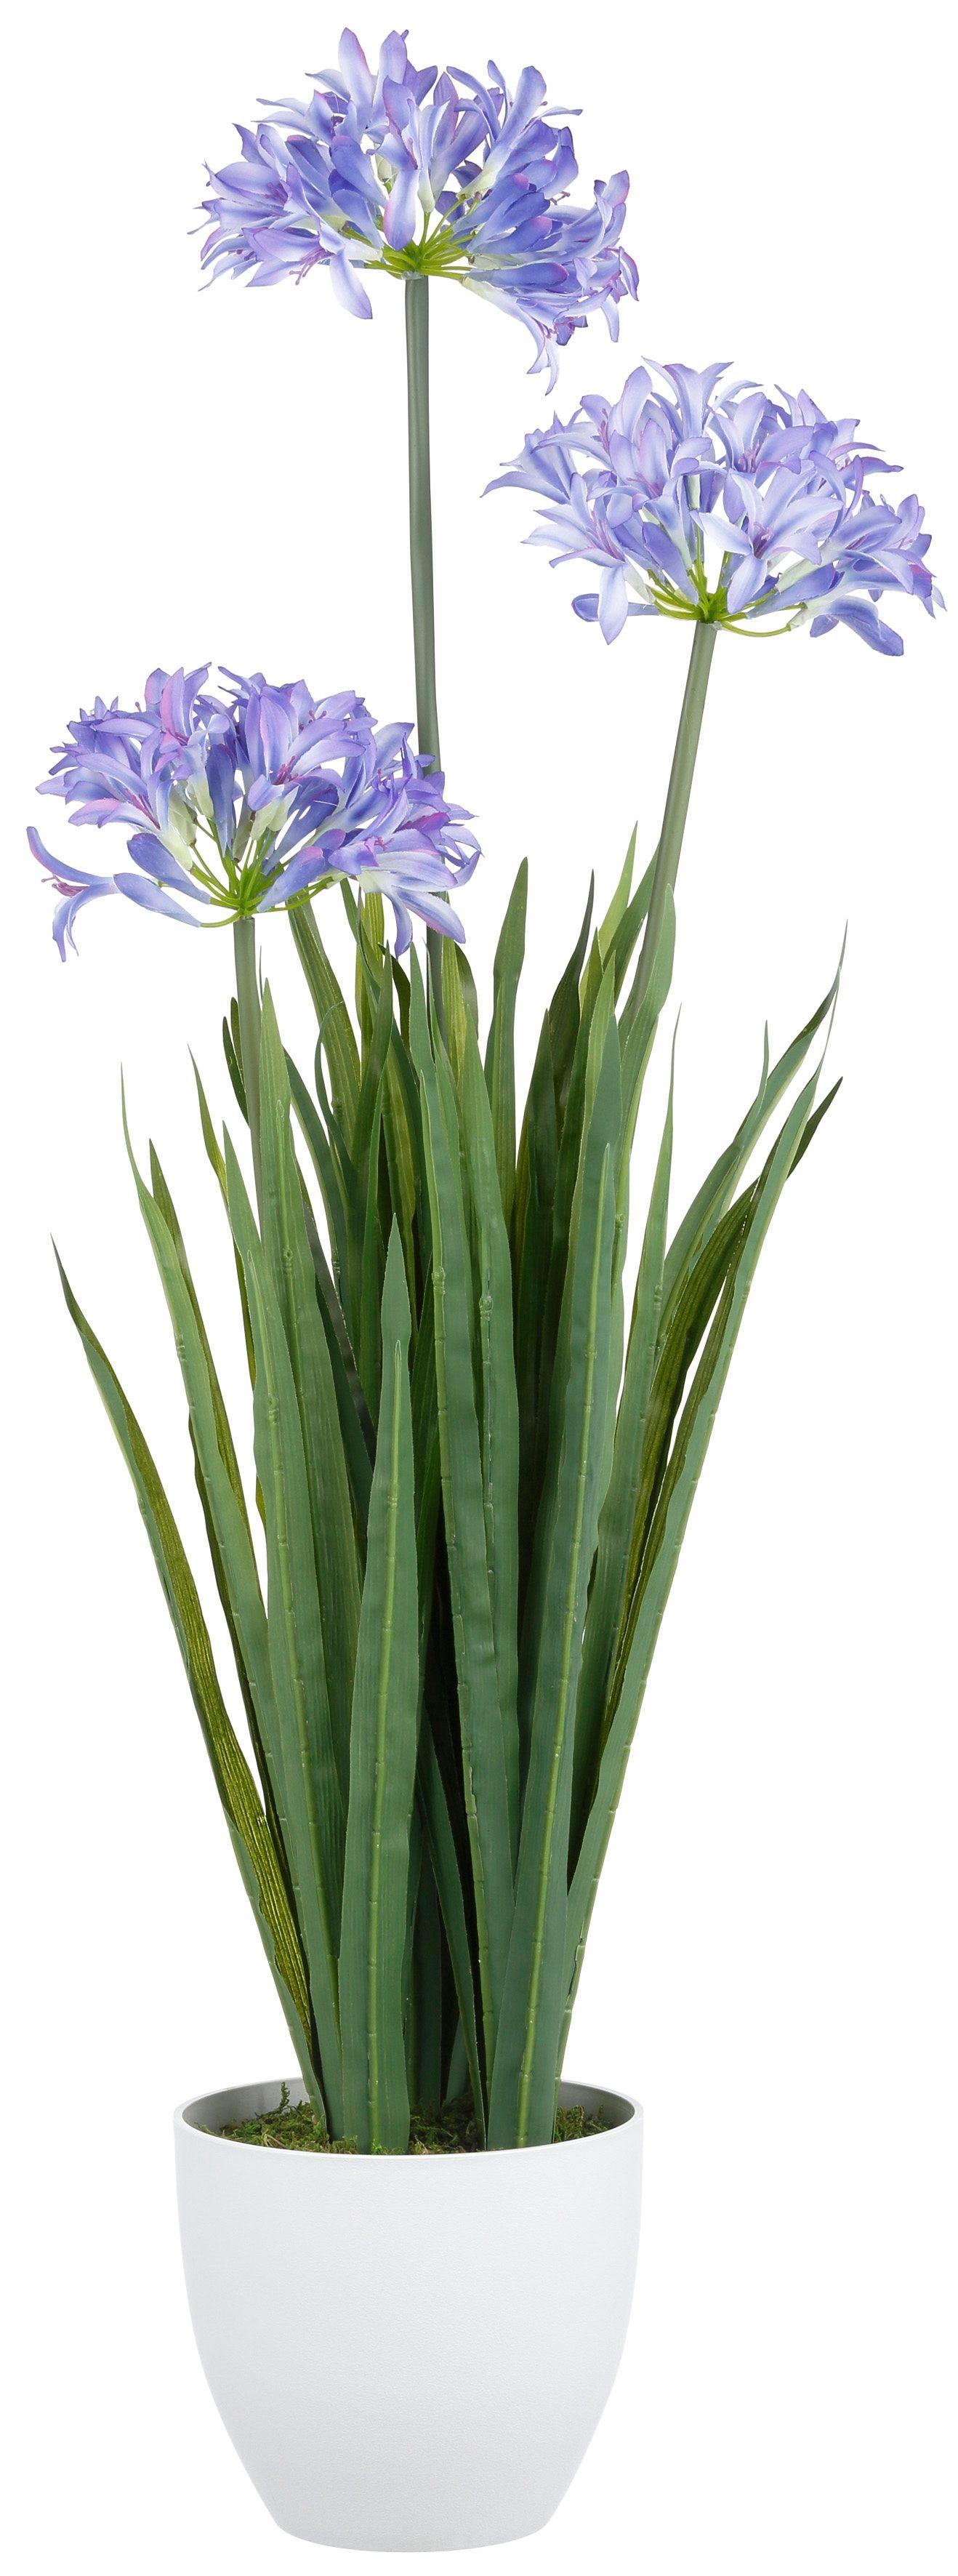 Home affaire Kunstblume »Agapanthus mit 2 oder 3 Blüten«